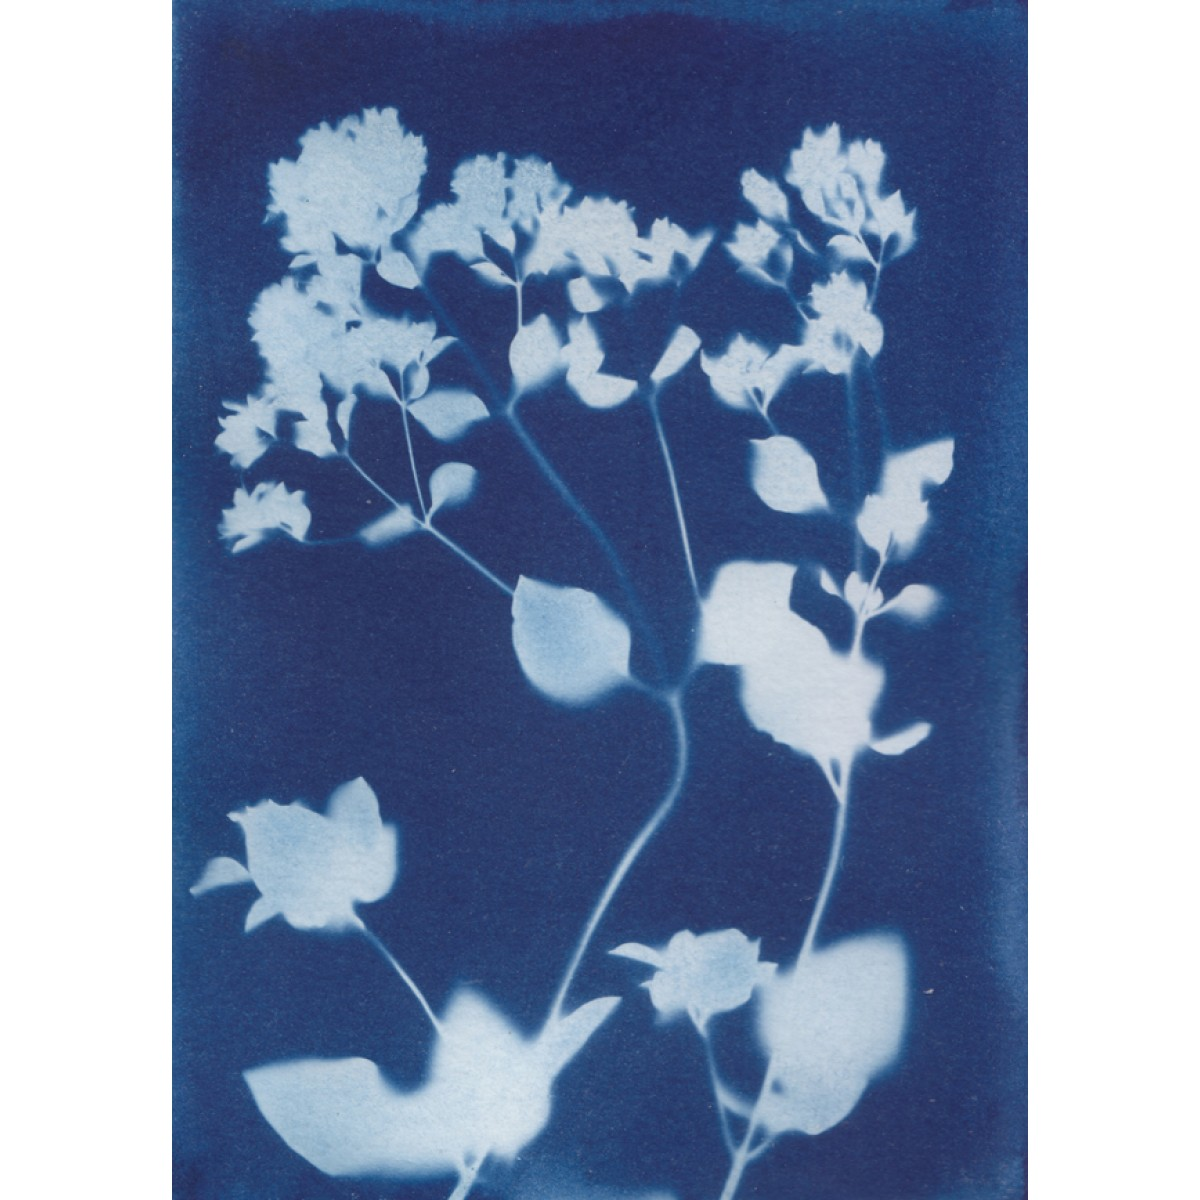 Anka Büchler, Floraler Blaudruck,Cyanotypie, Unikat, A6, Motiv 4